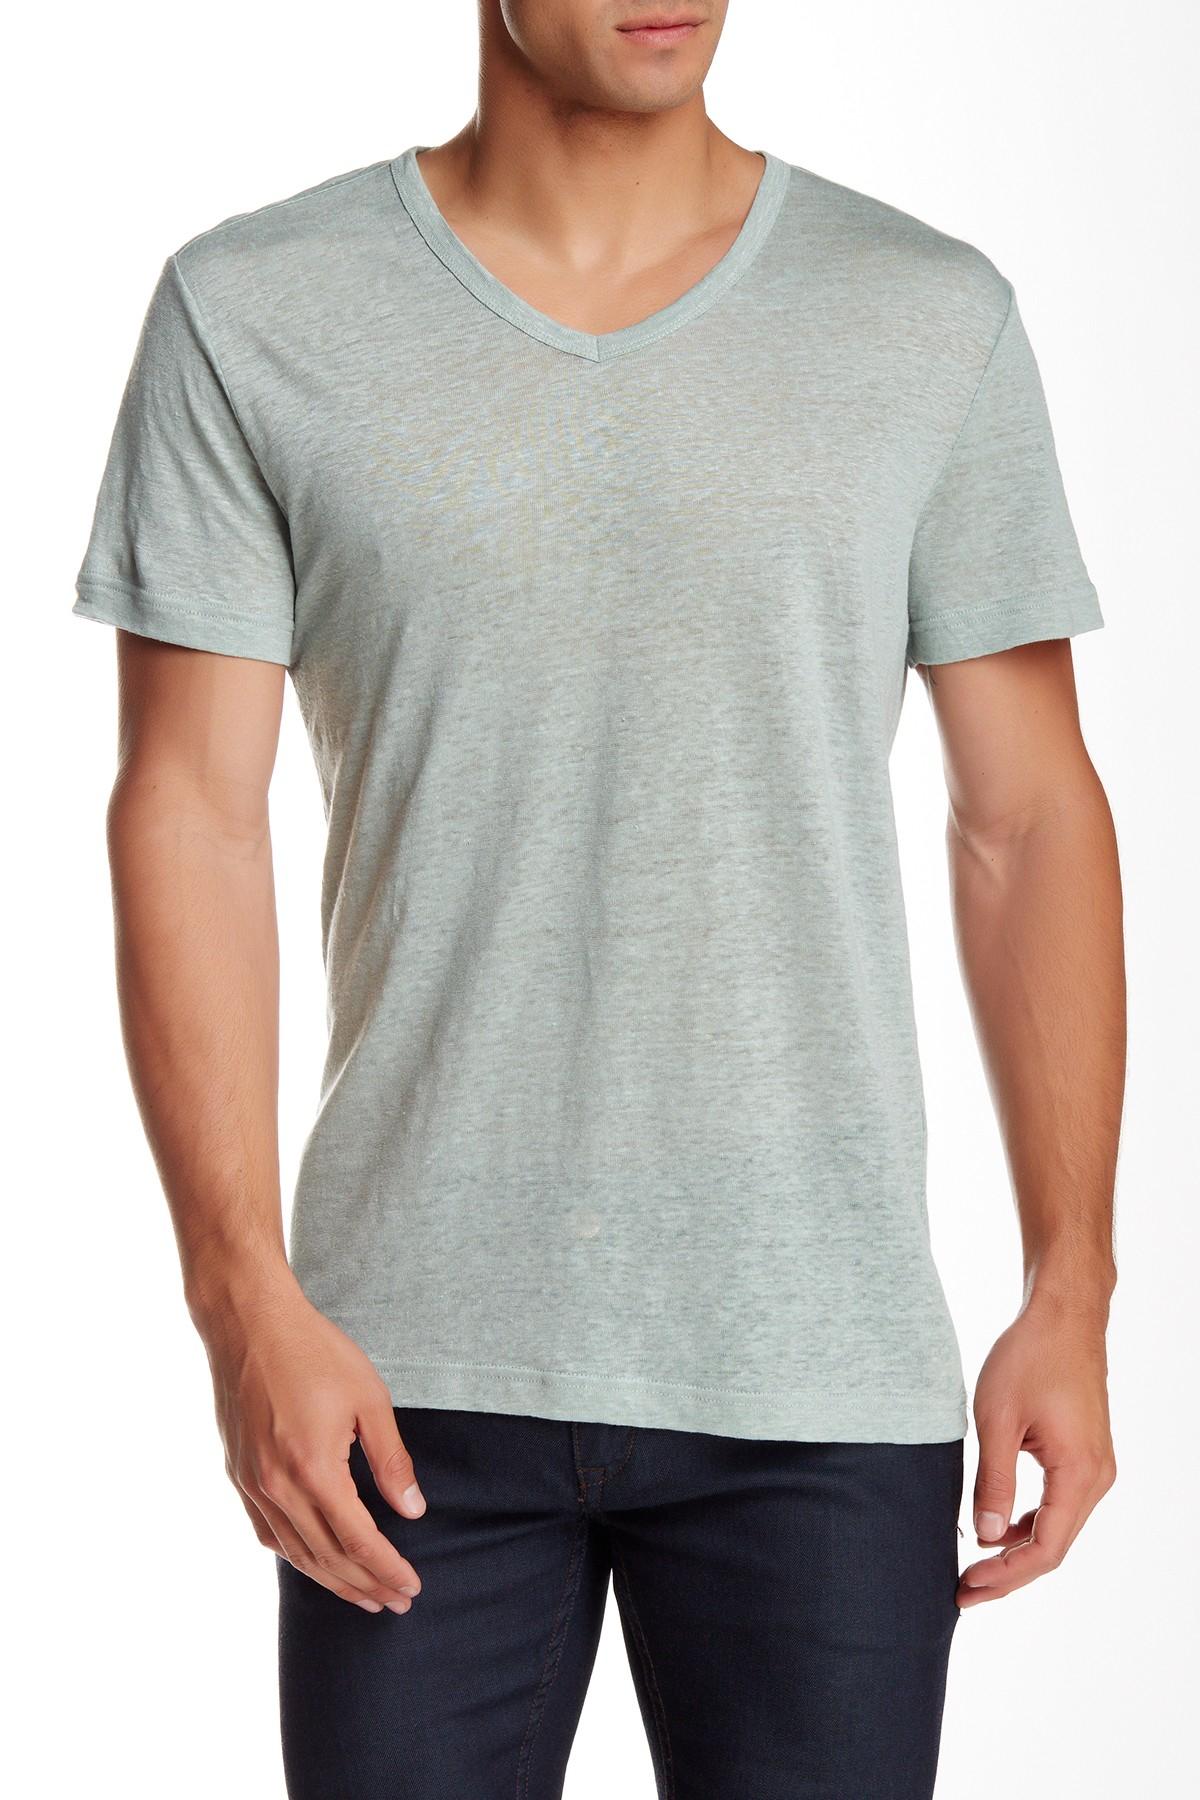 Slate And Stone Clothing : Slate stone short sleeve v neck linen tee in gray for